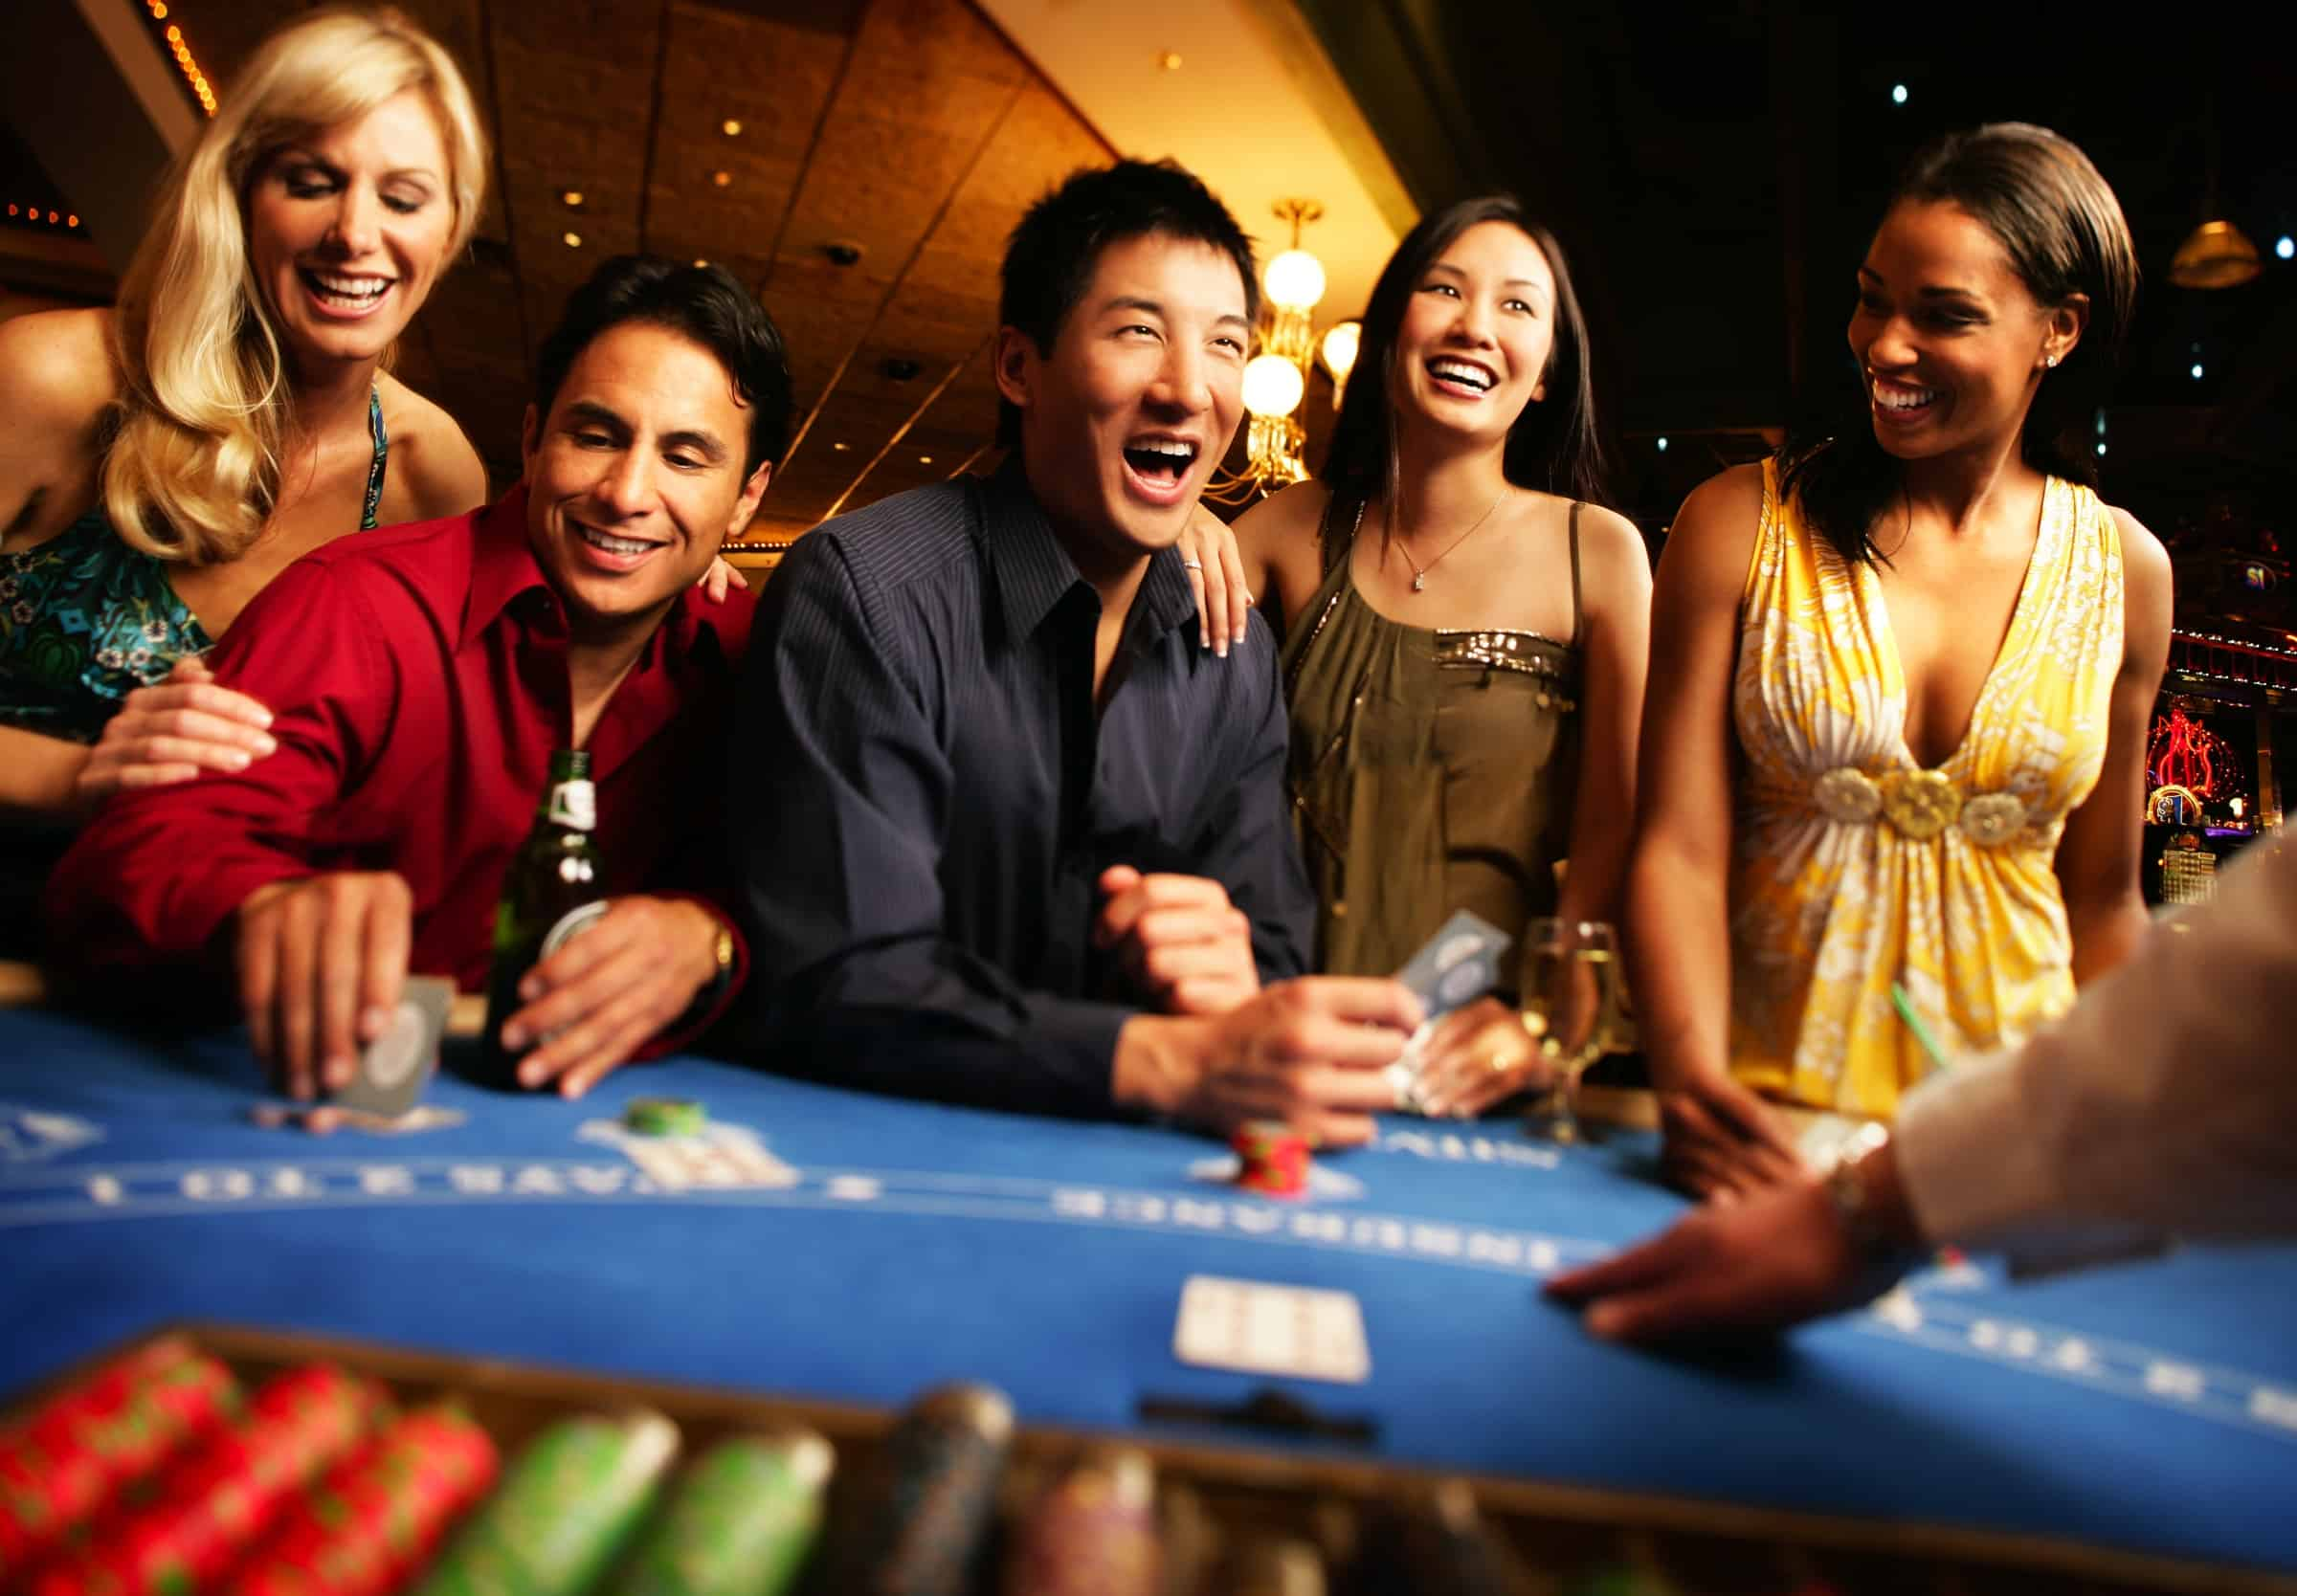 a group of people enjoying a casino night